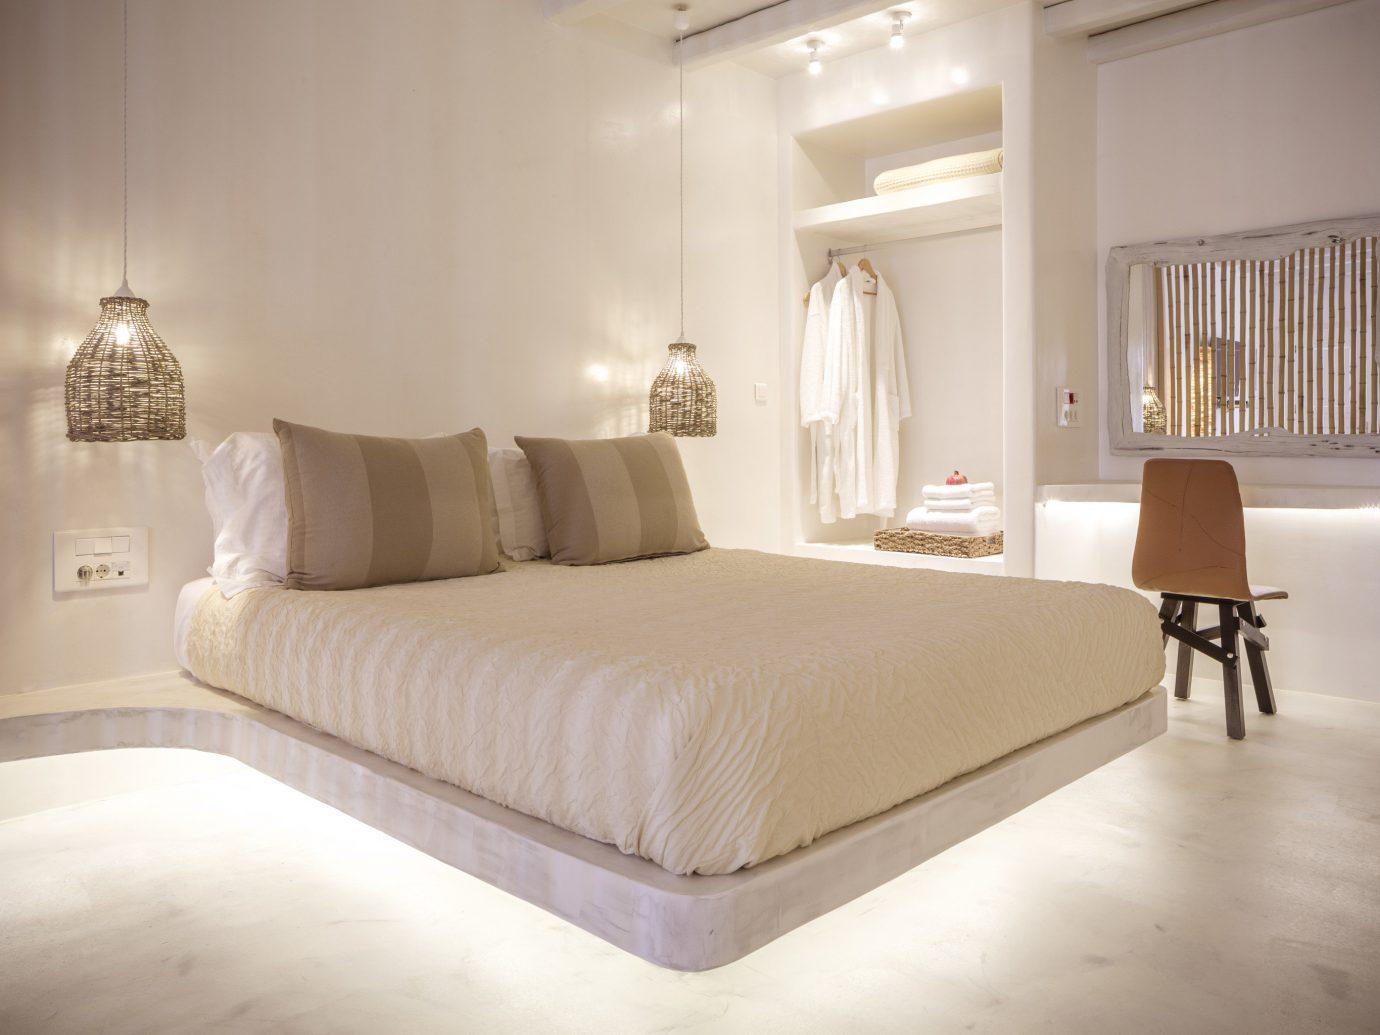 Hotels indoor wall bed floor room property Bedroom hotel furniture interior design bed frame Suite estate living room Design real estate apartment decorated